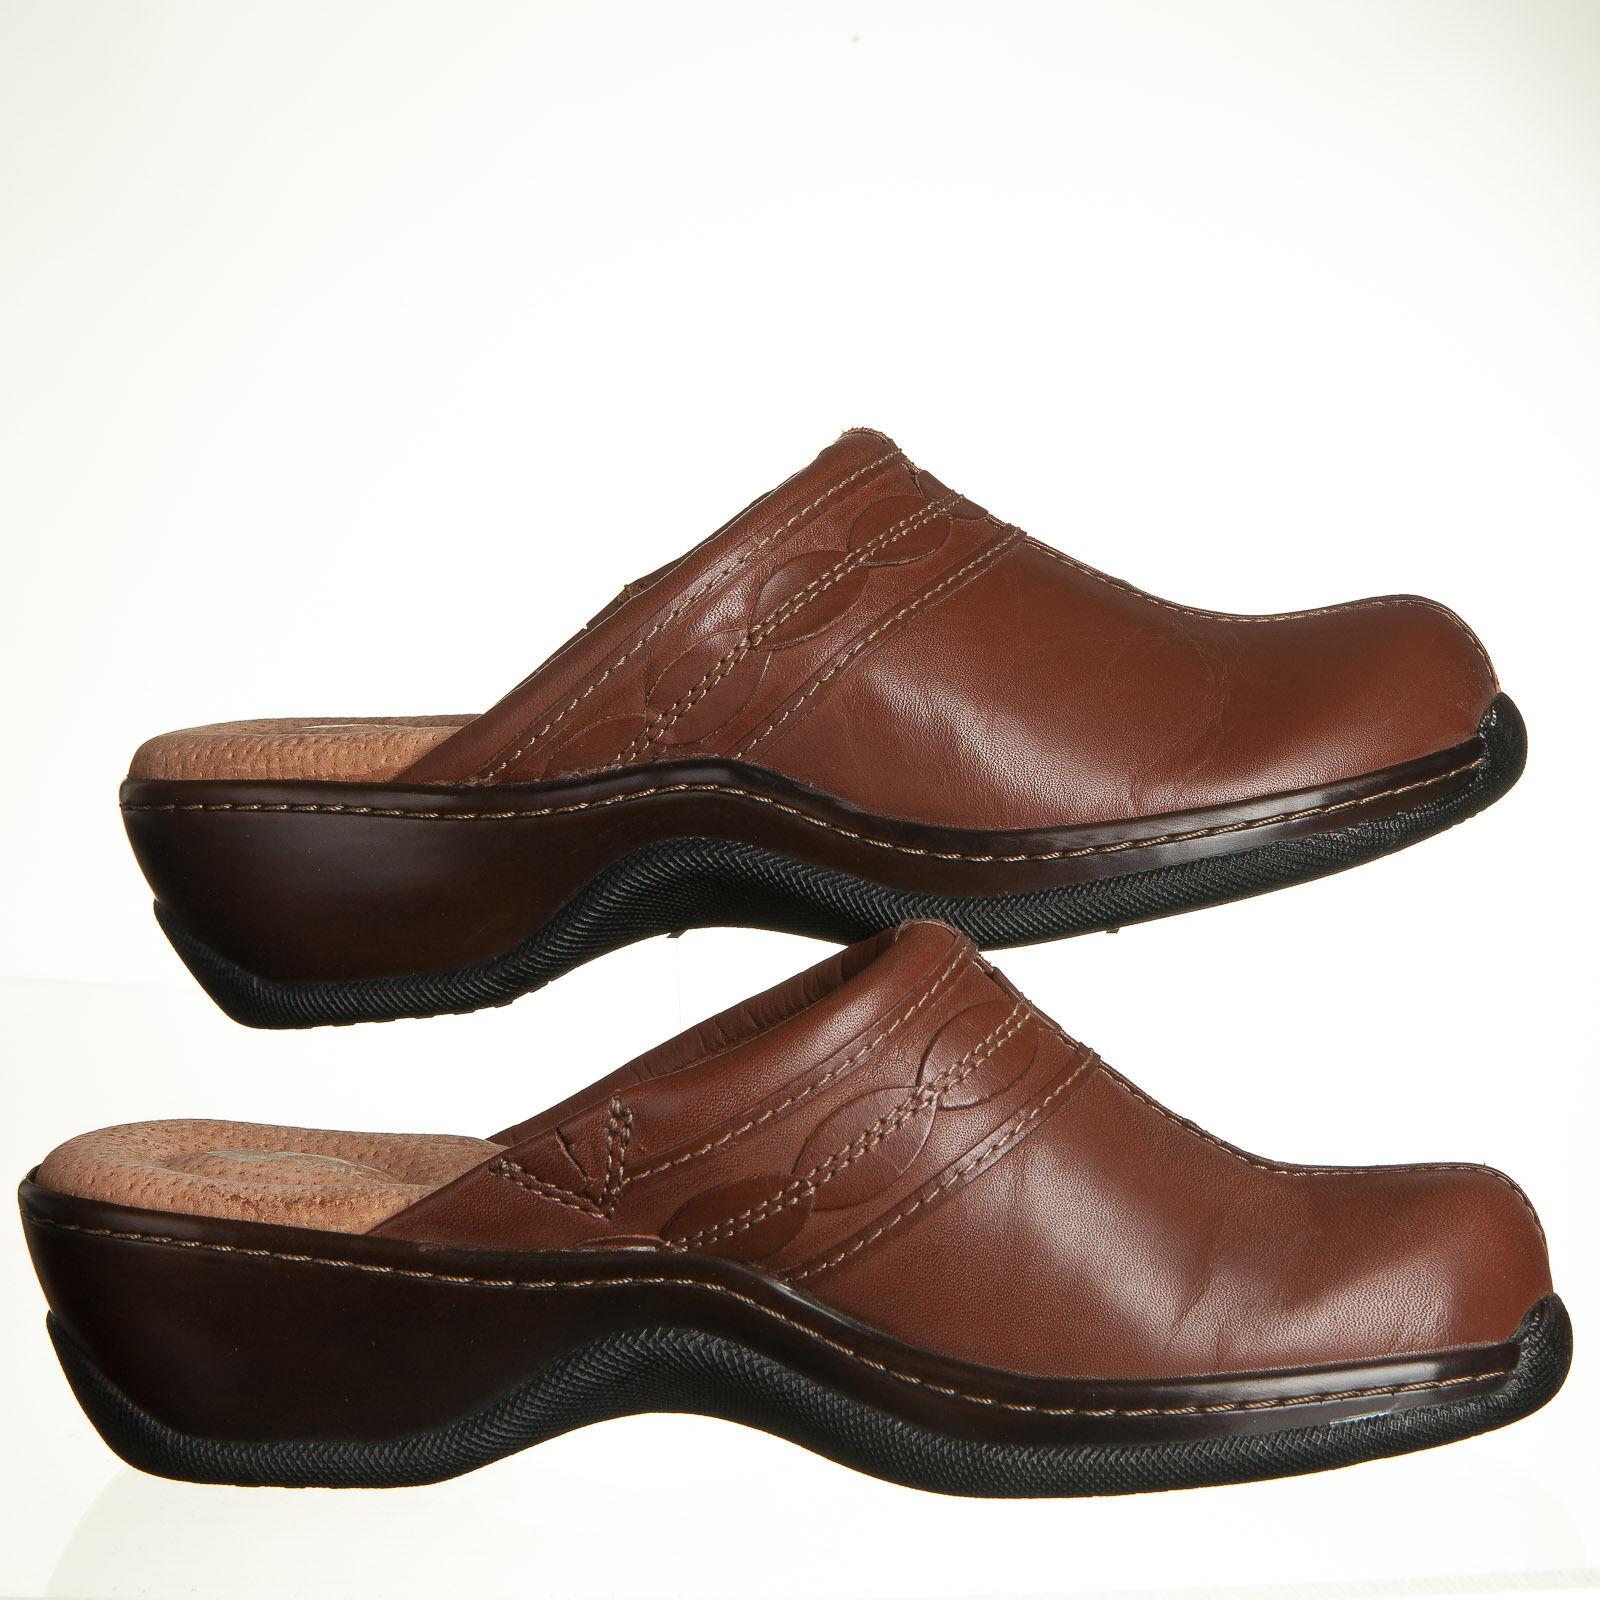 SoftWalk Abby Brown Cognac Pelle Clogs - Donna Size 6M